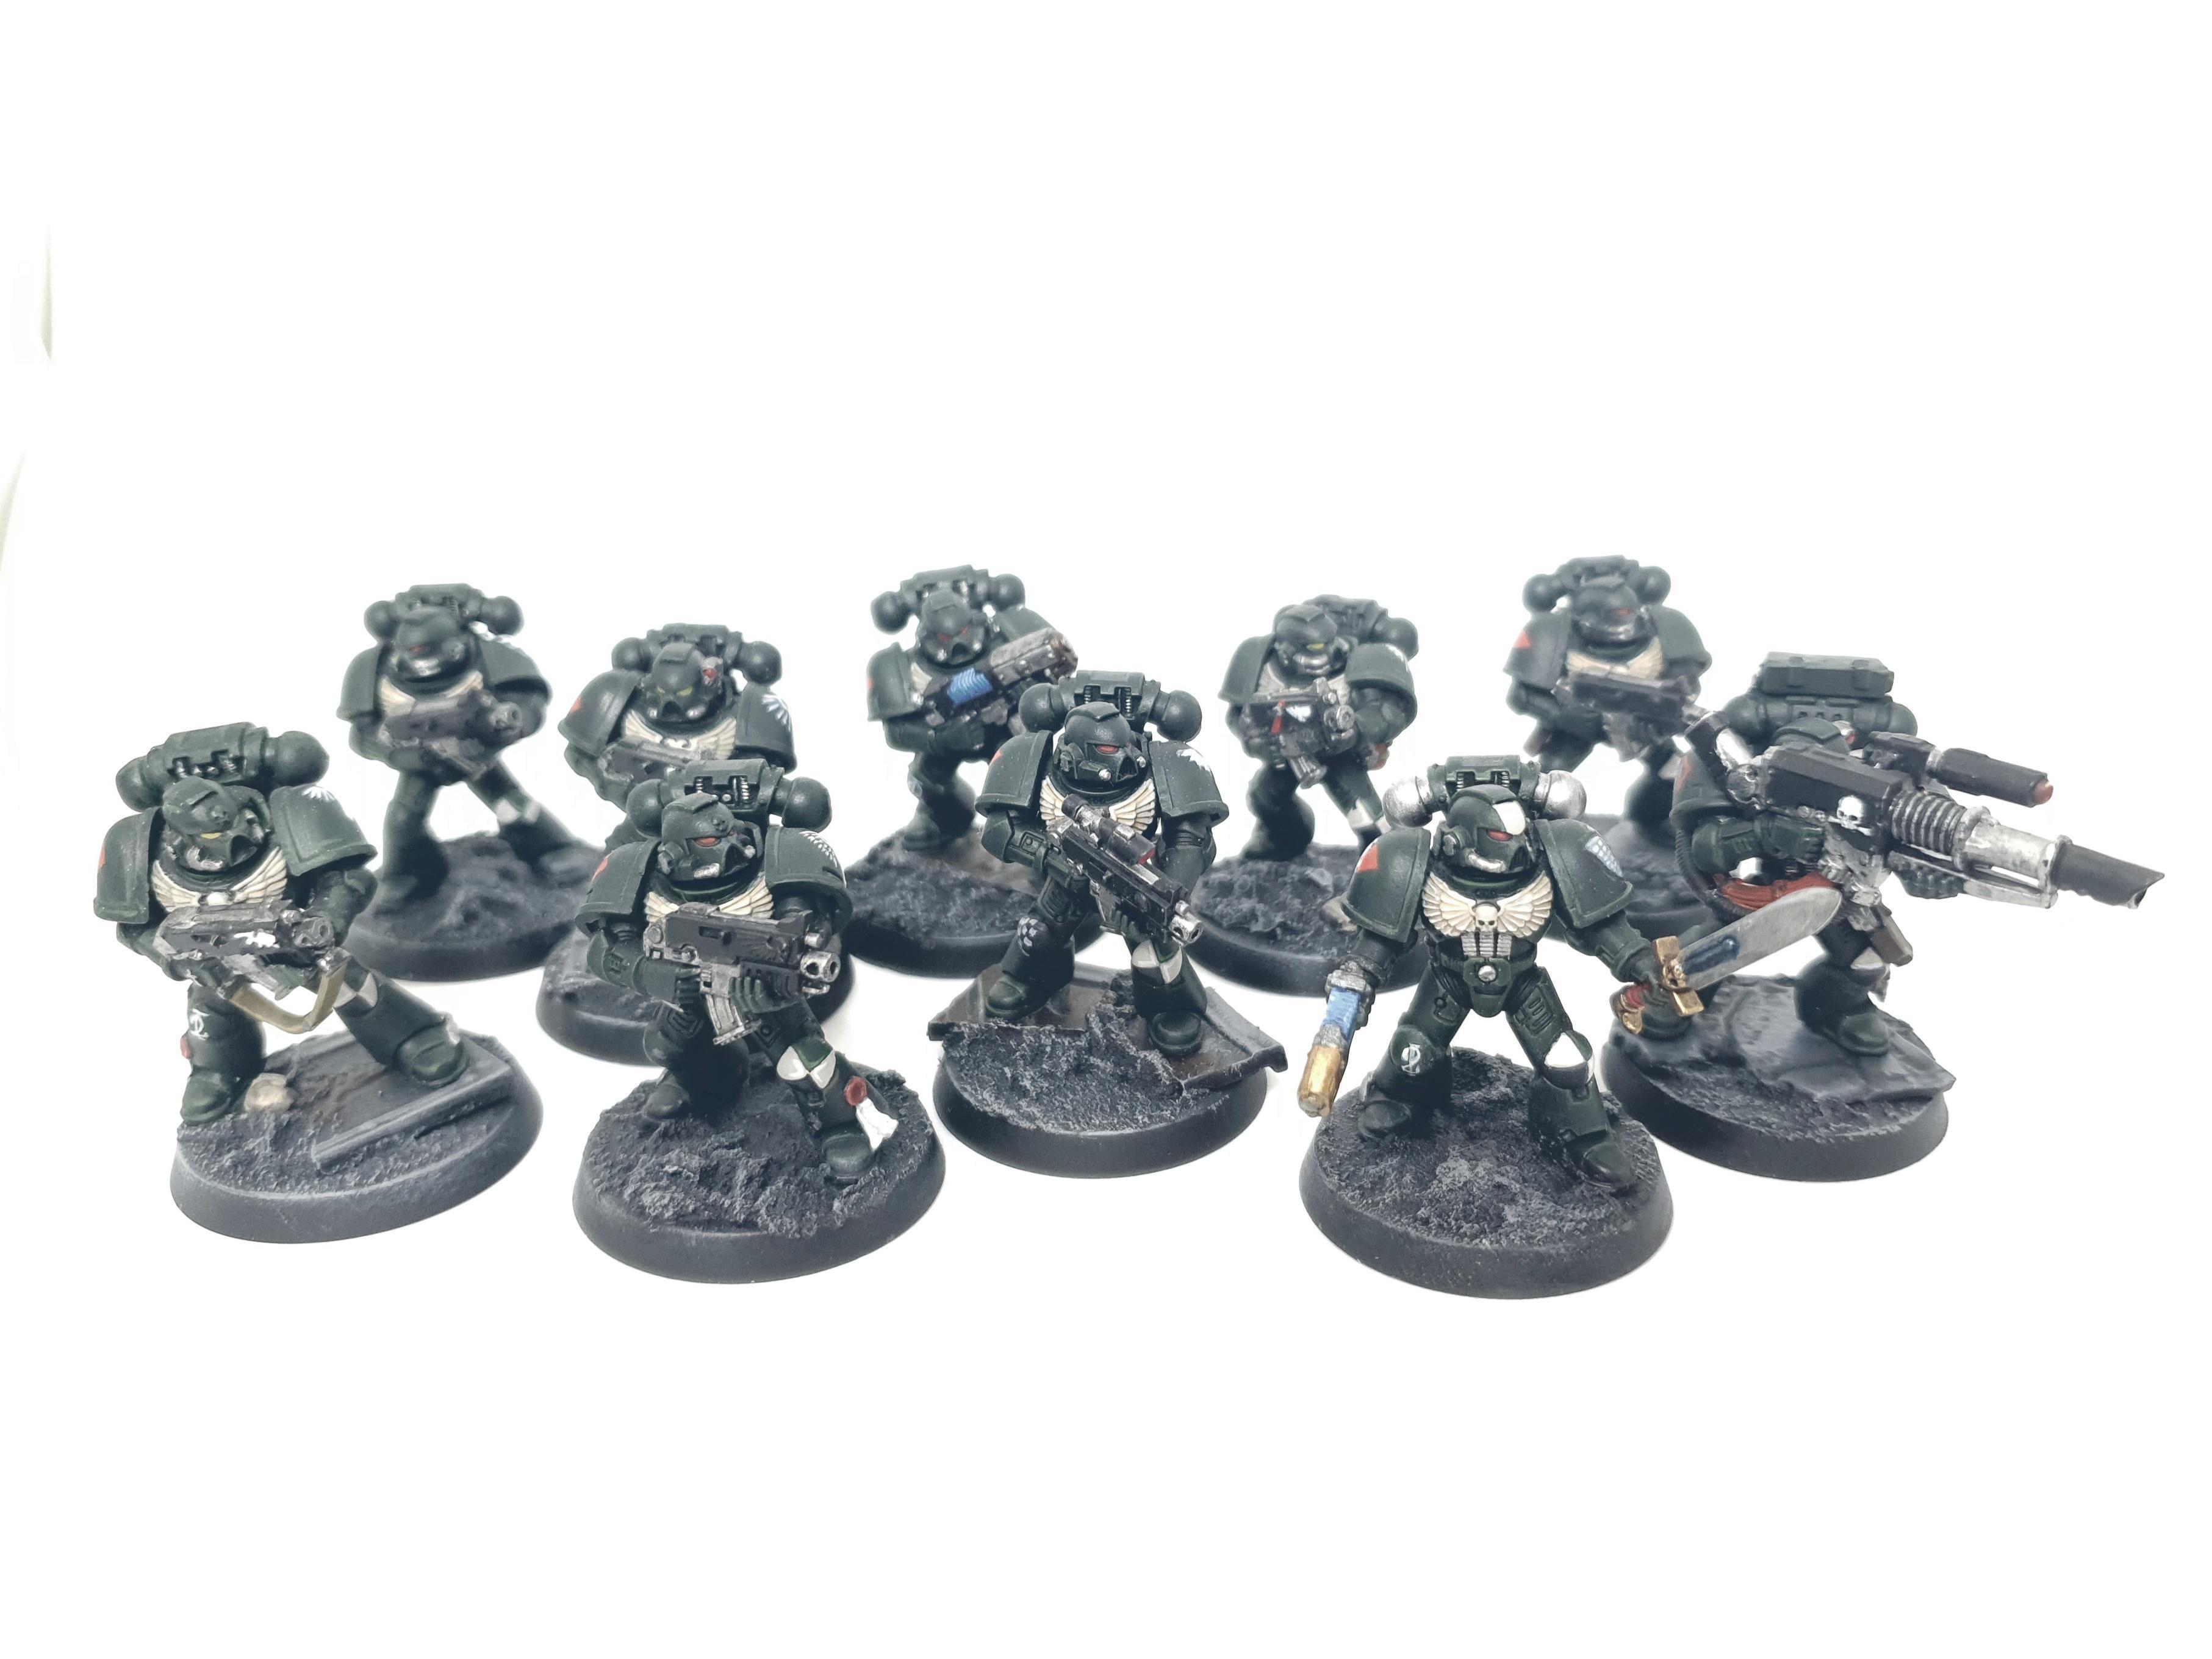 1st, 5th, Adeptus, Angel, Astartes, Company, Dark, First, Imperium, Legion, Space, Space Marines, Squad, Tactical, Warhammer 40,000, Warhammer Fantasy